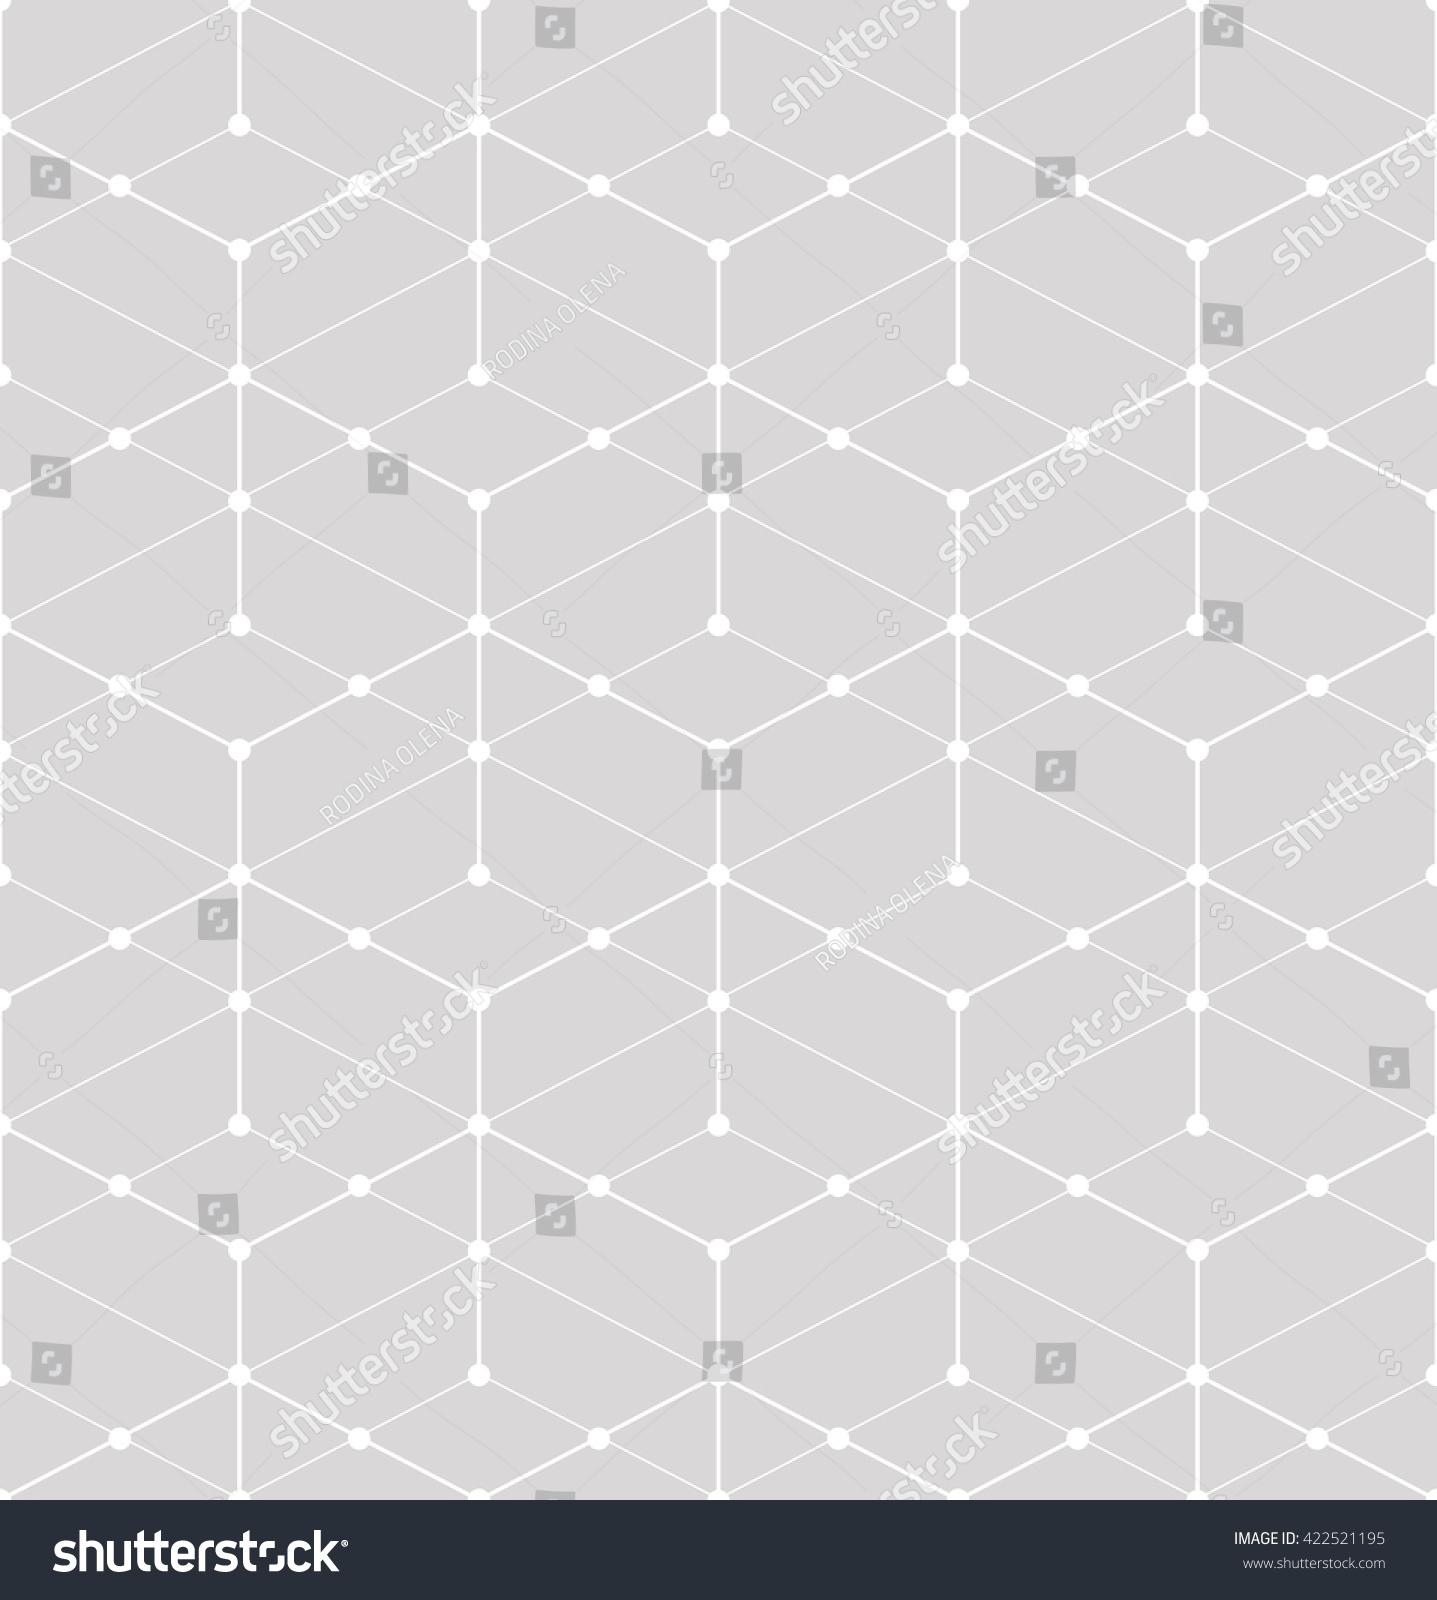 Edit Vectors Free Online - Abstract geometric